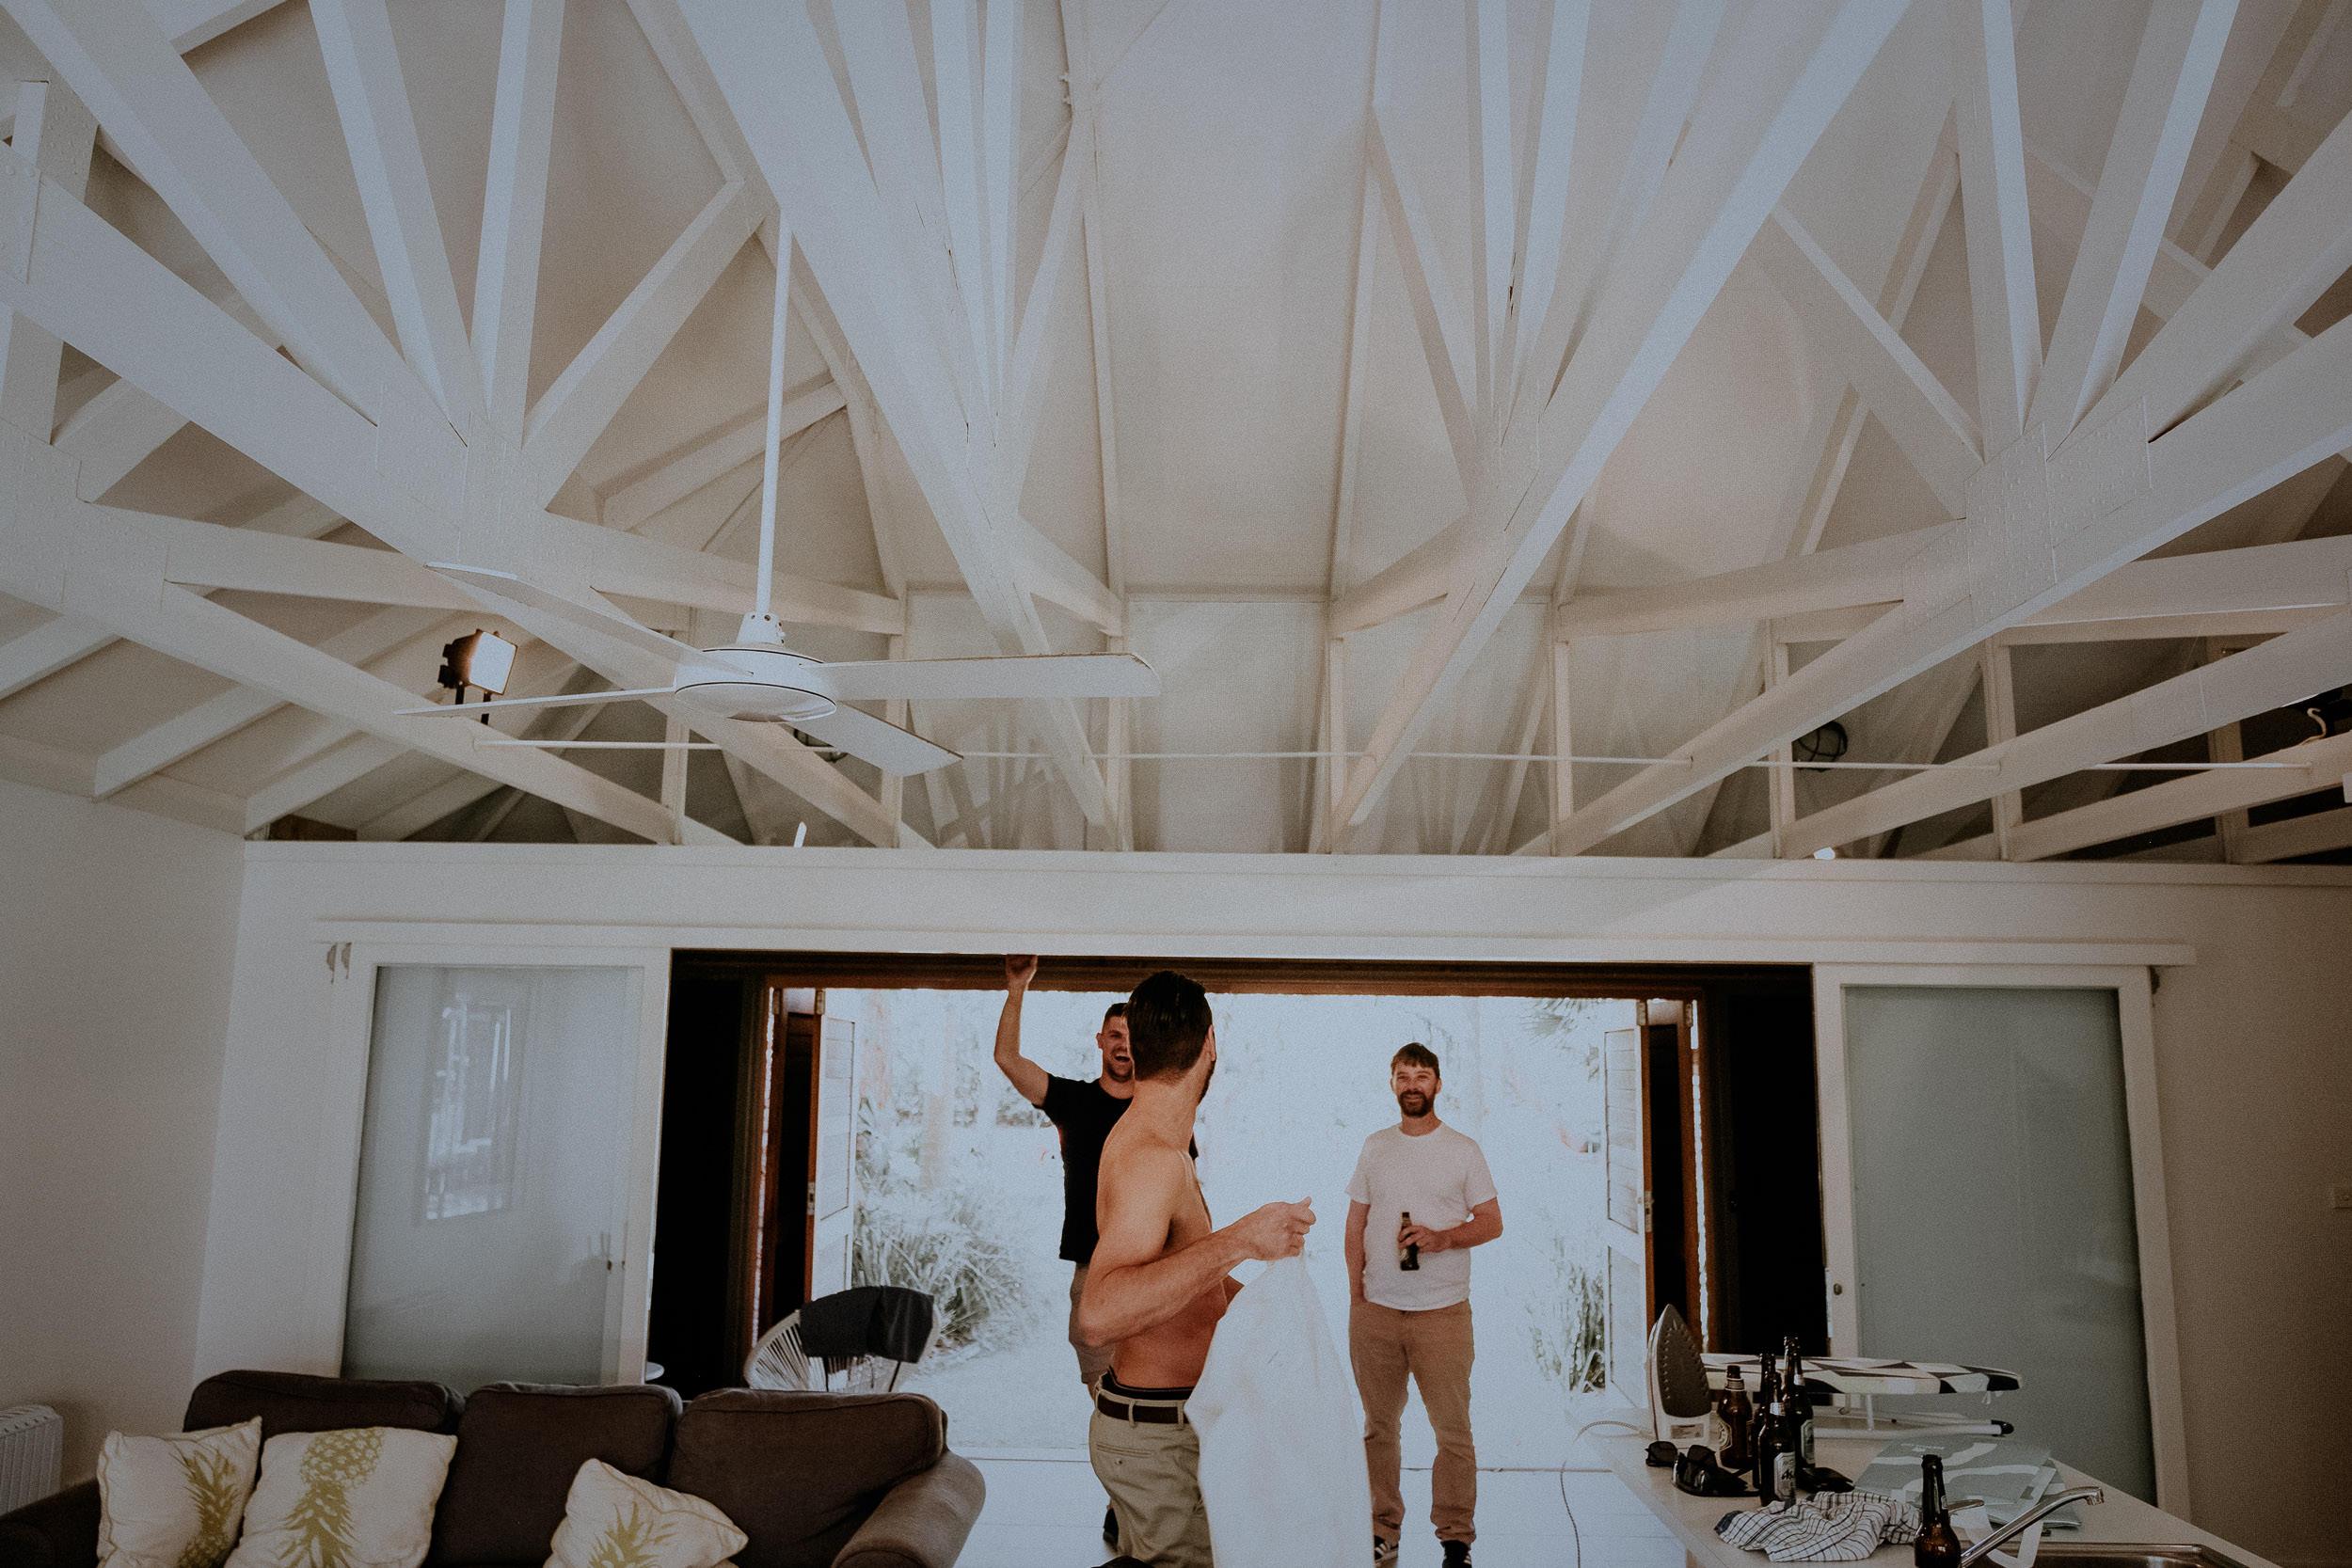 S&A Elopement - Kings & Thieves - Shred 'Til Dead - Central Coast Beach Forest Wedding - 6.jpg